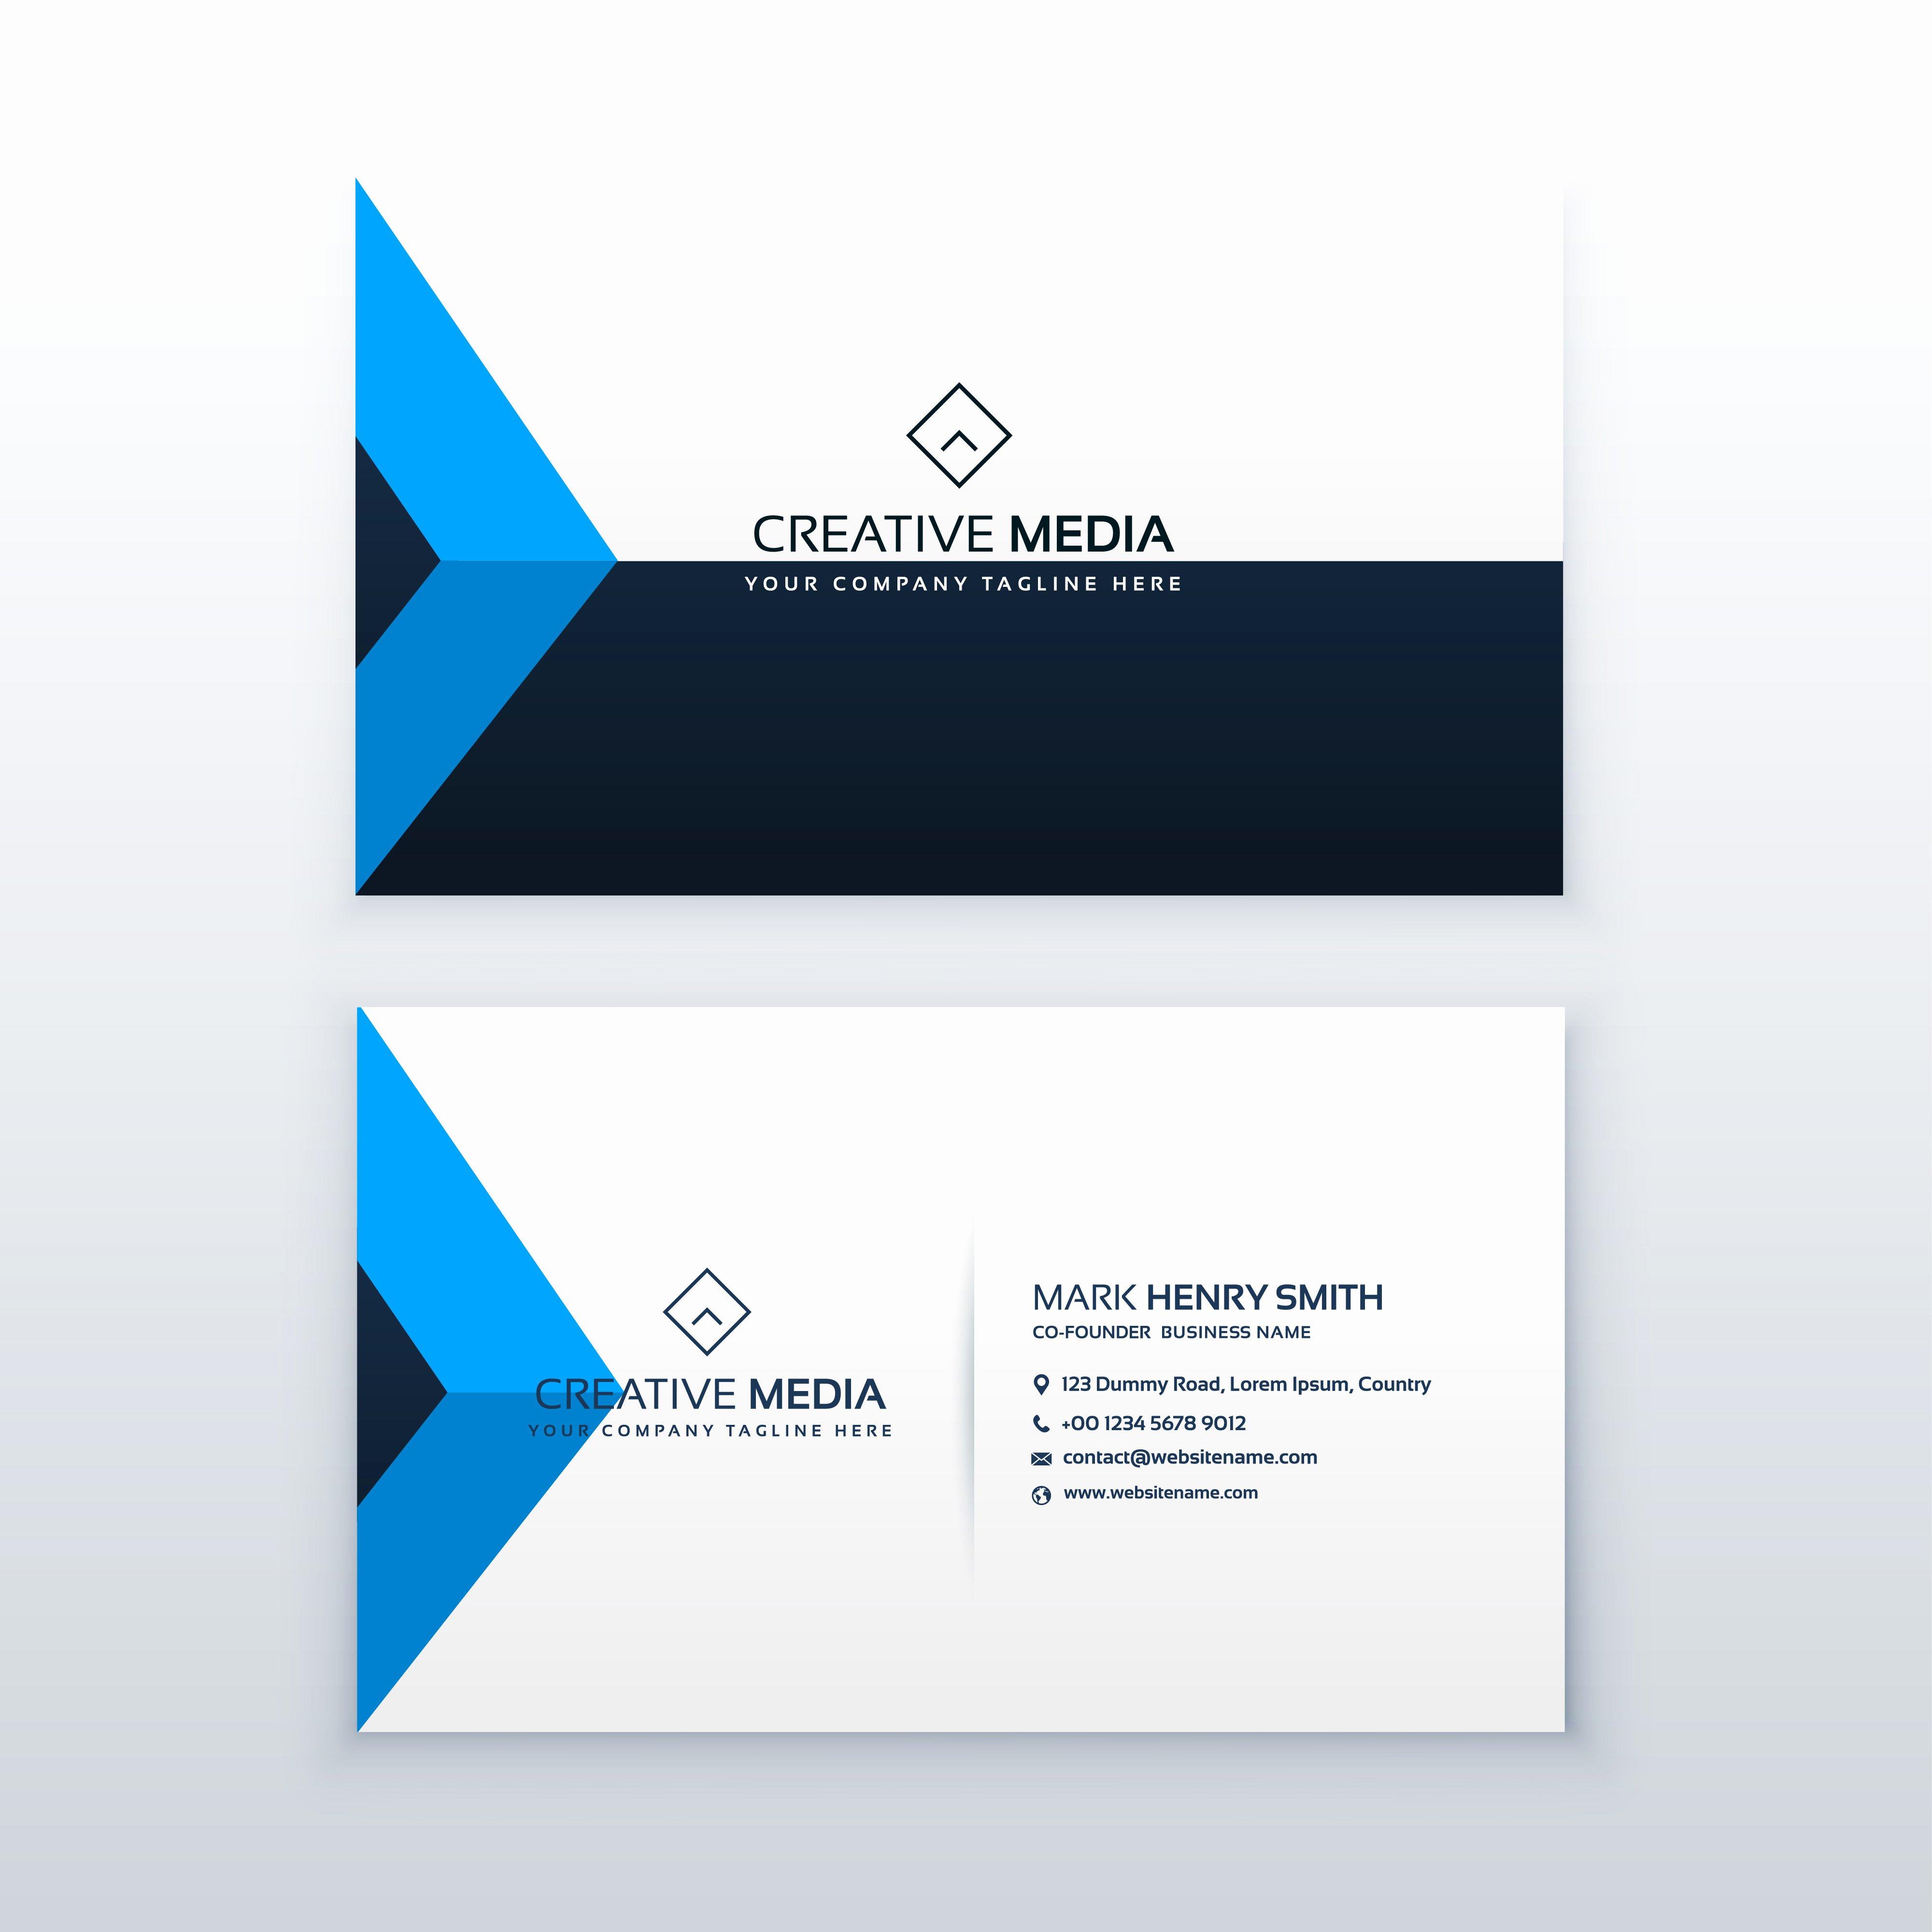 Business Card Template Vector Lovely Modern Clean Business Card Vector Design Template